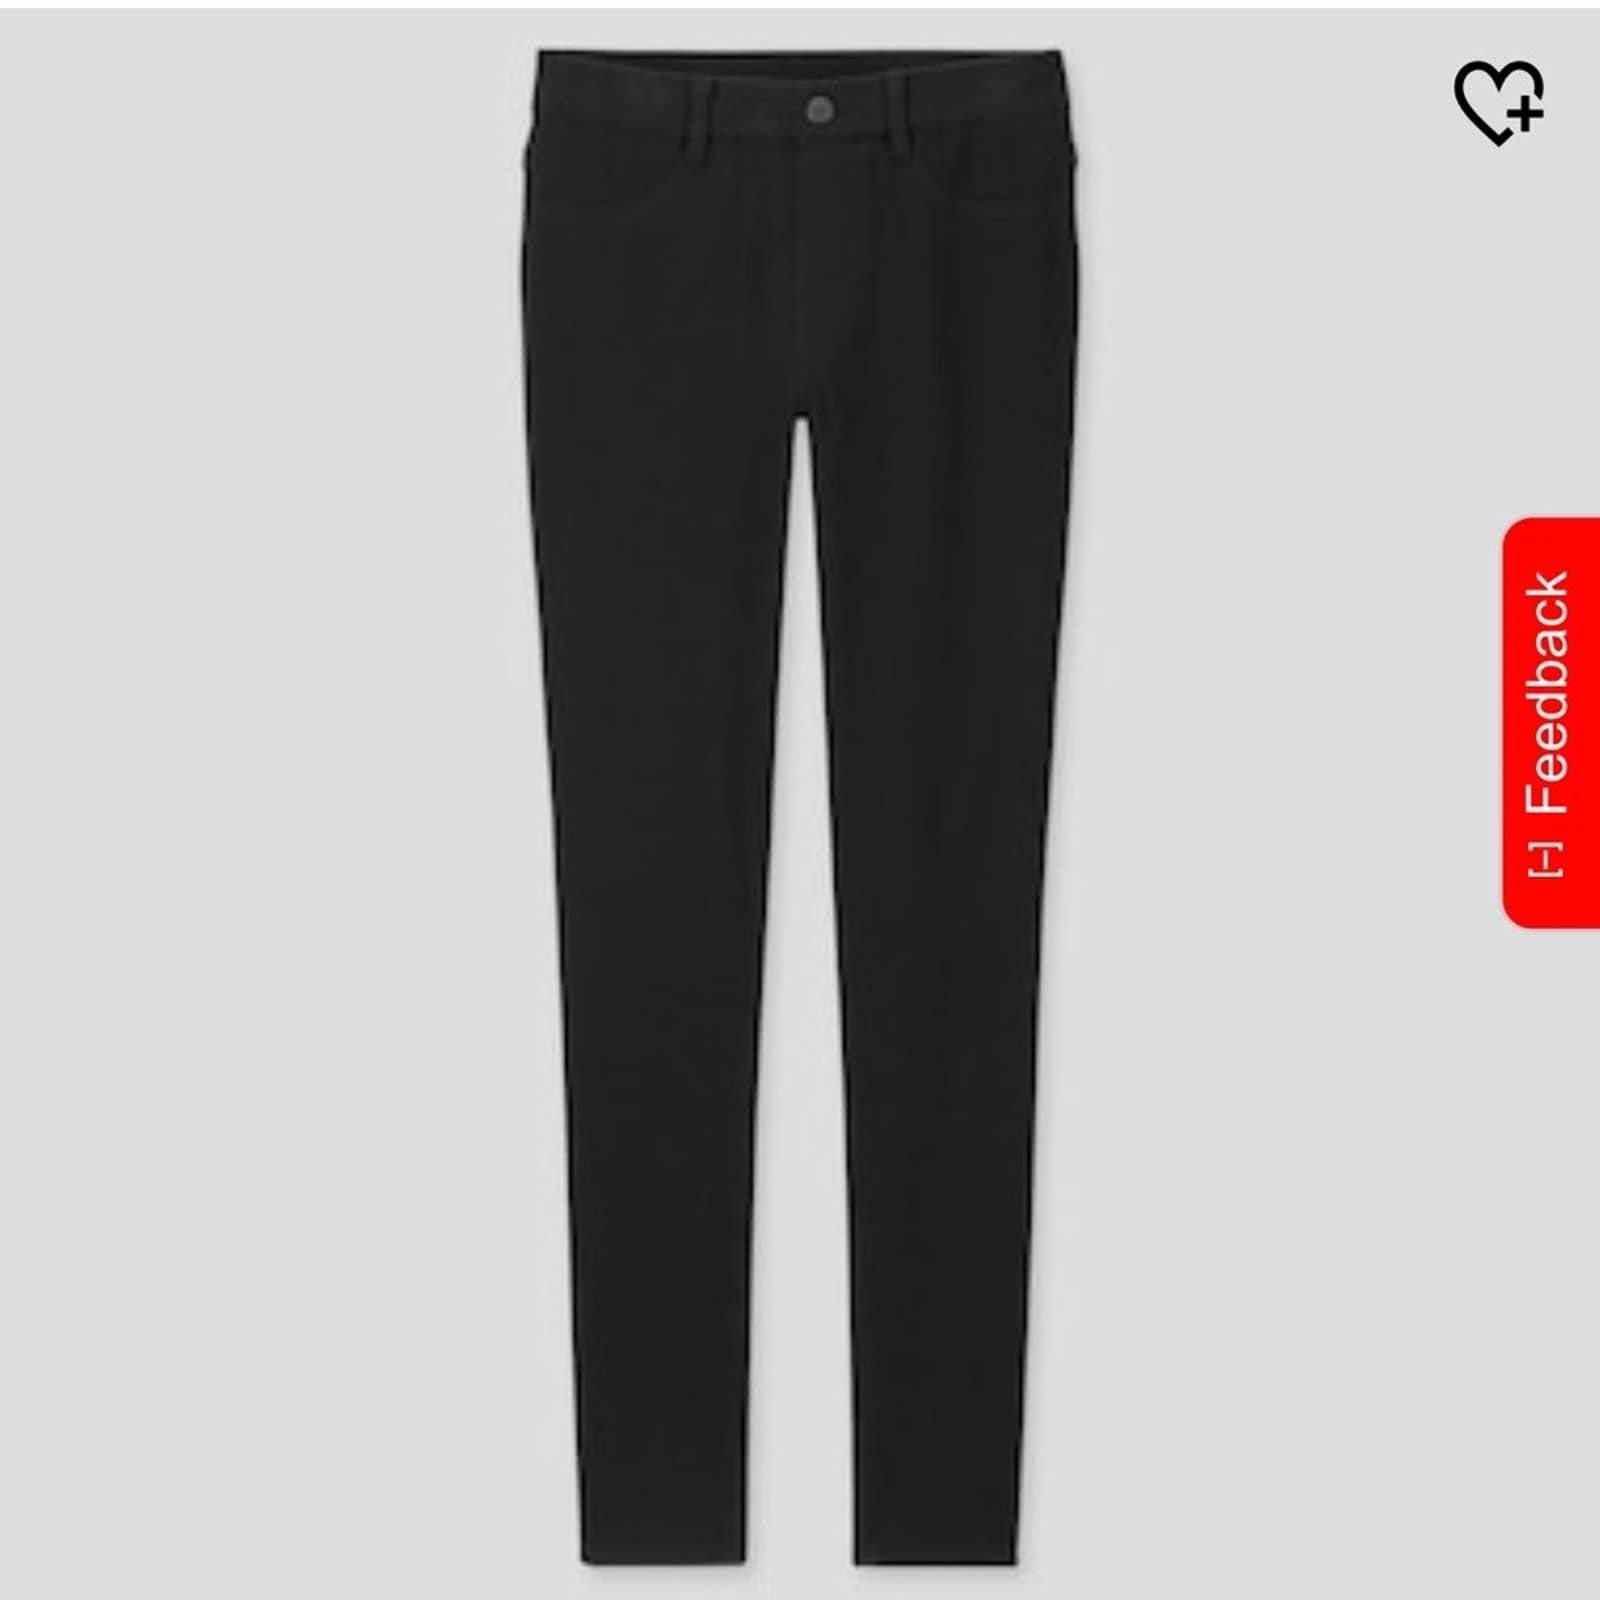 Uniqlo ultra stretch leggings pants XL